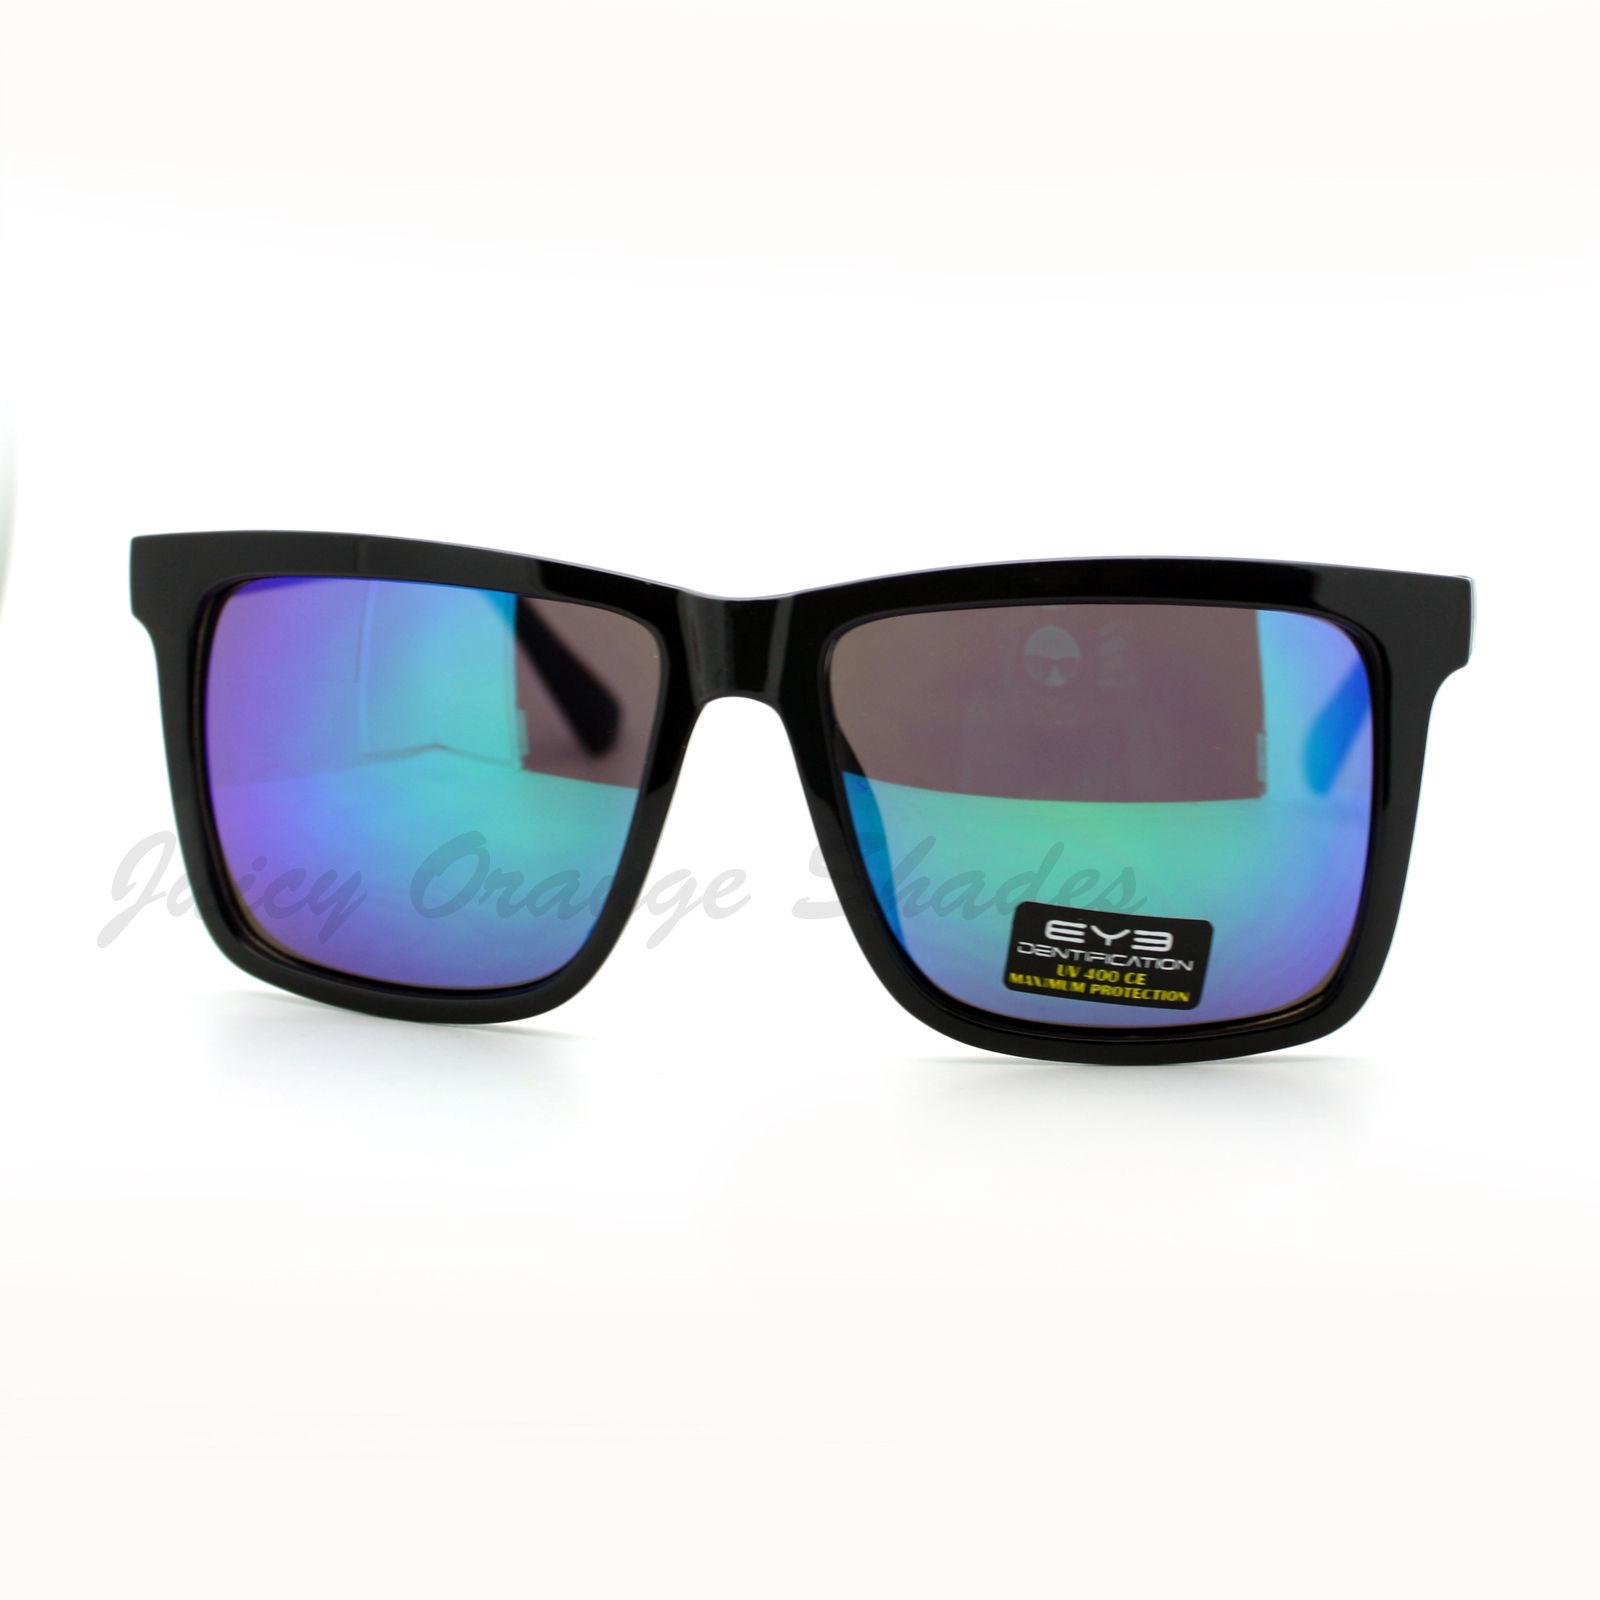 Black Square Frame Sunglasses Multicolor Mirror Lens Unisex UV400